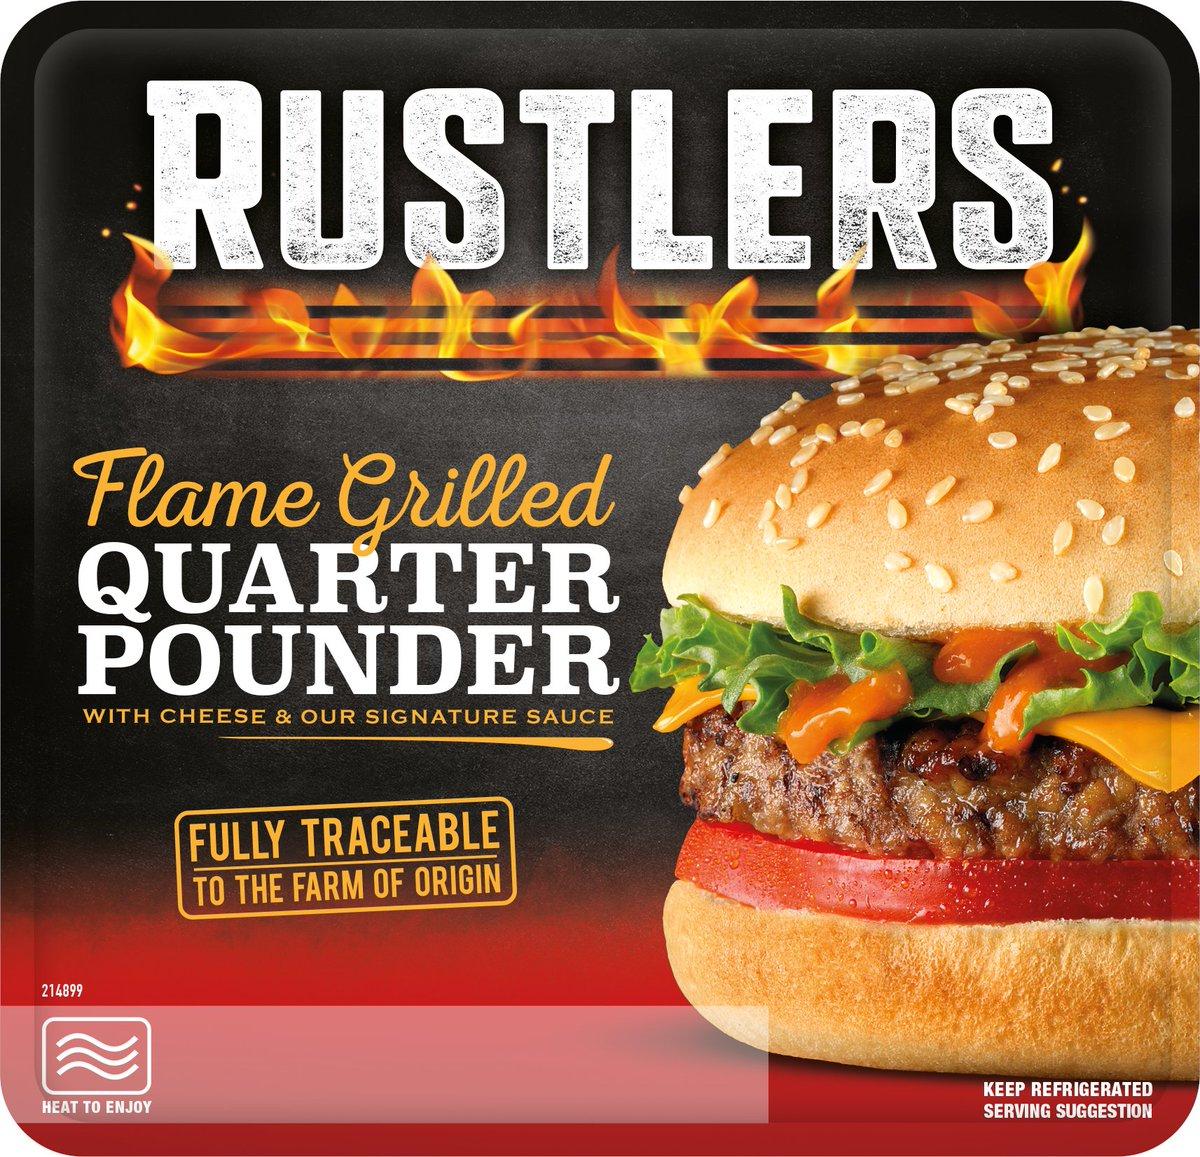 192G Rustlers Quarter Pounder, 59p at Farmfoods (Preston)